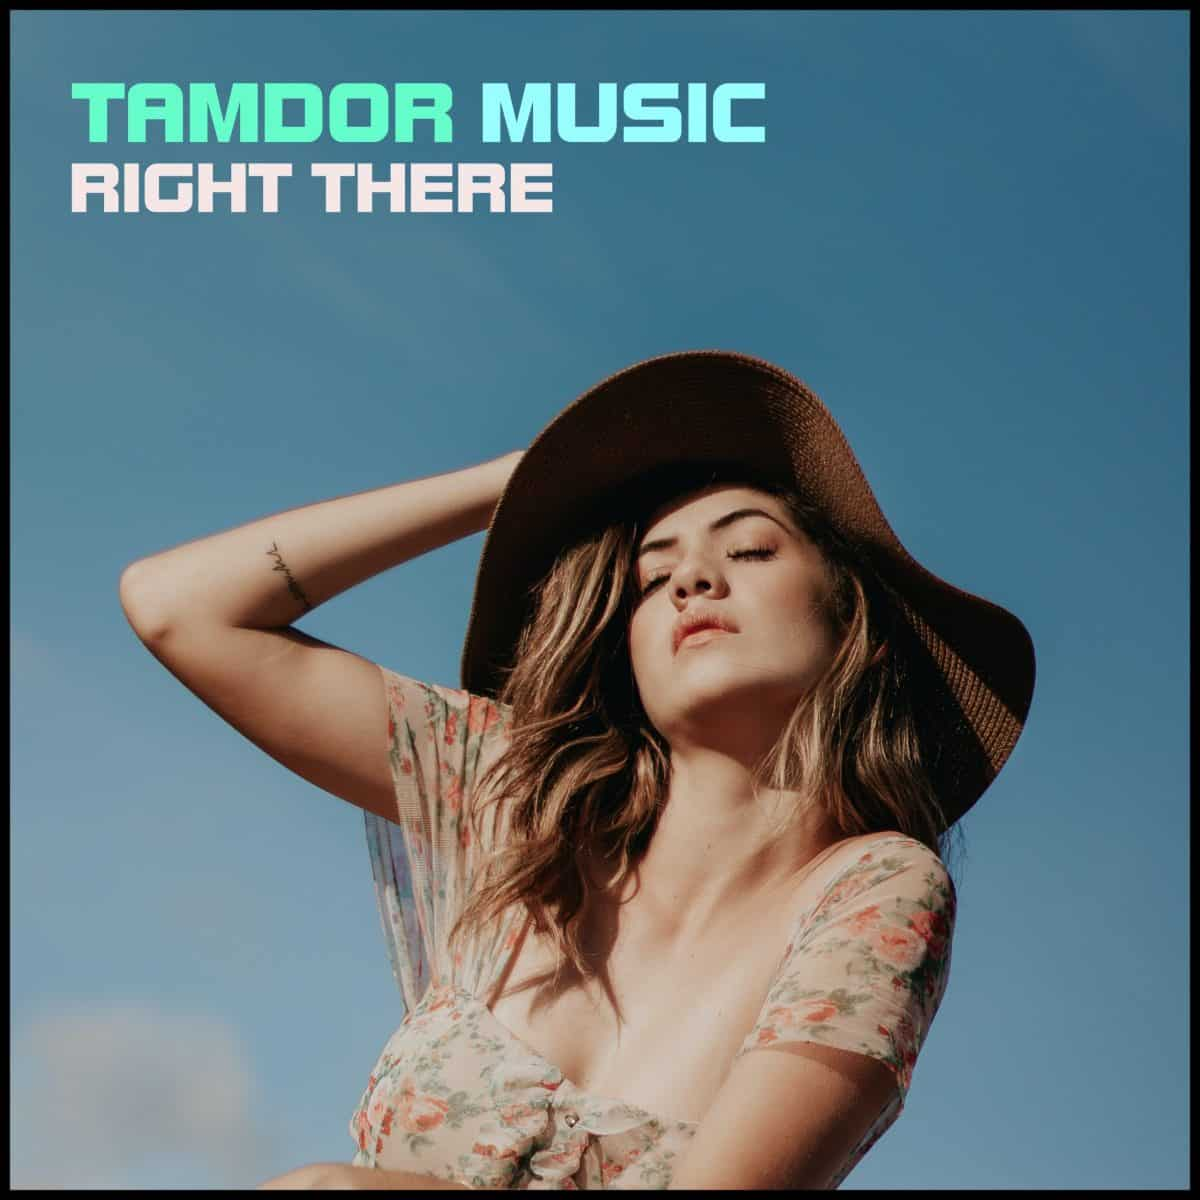 Tamdor Music